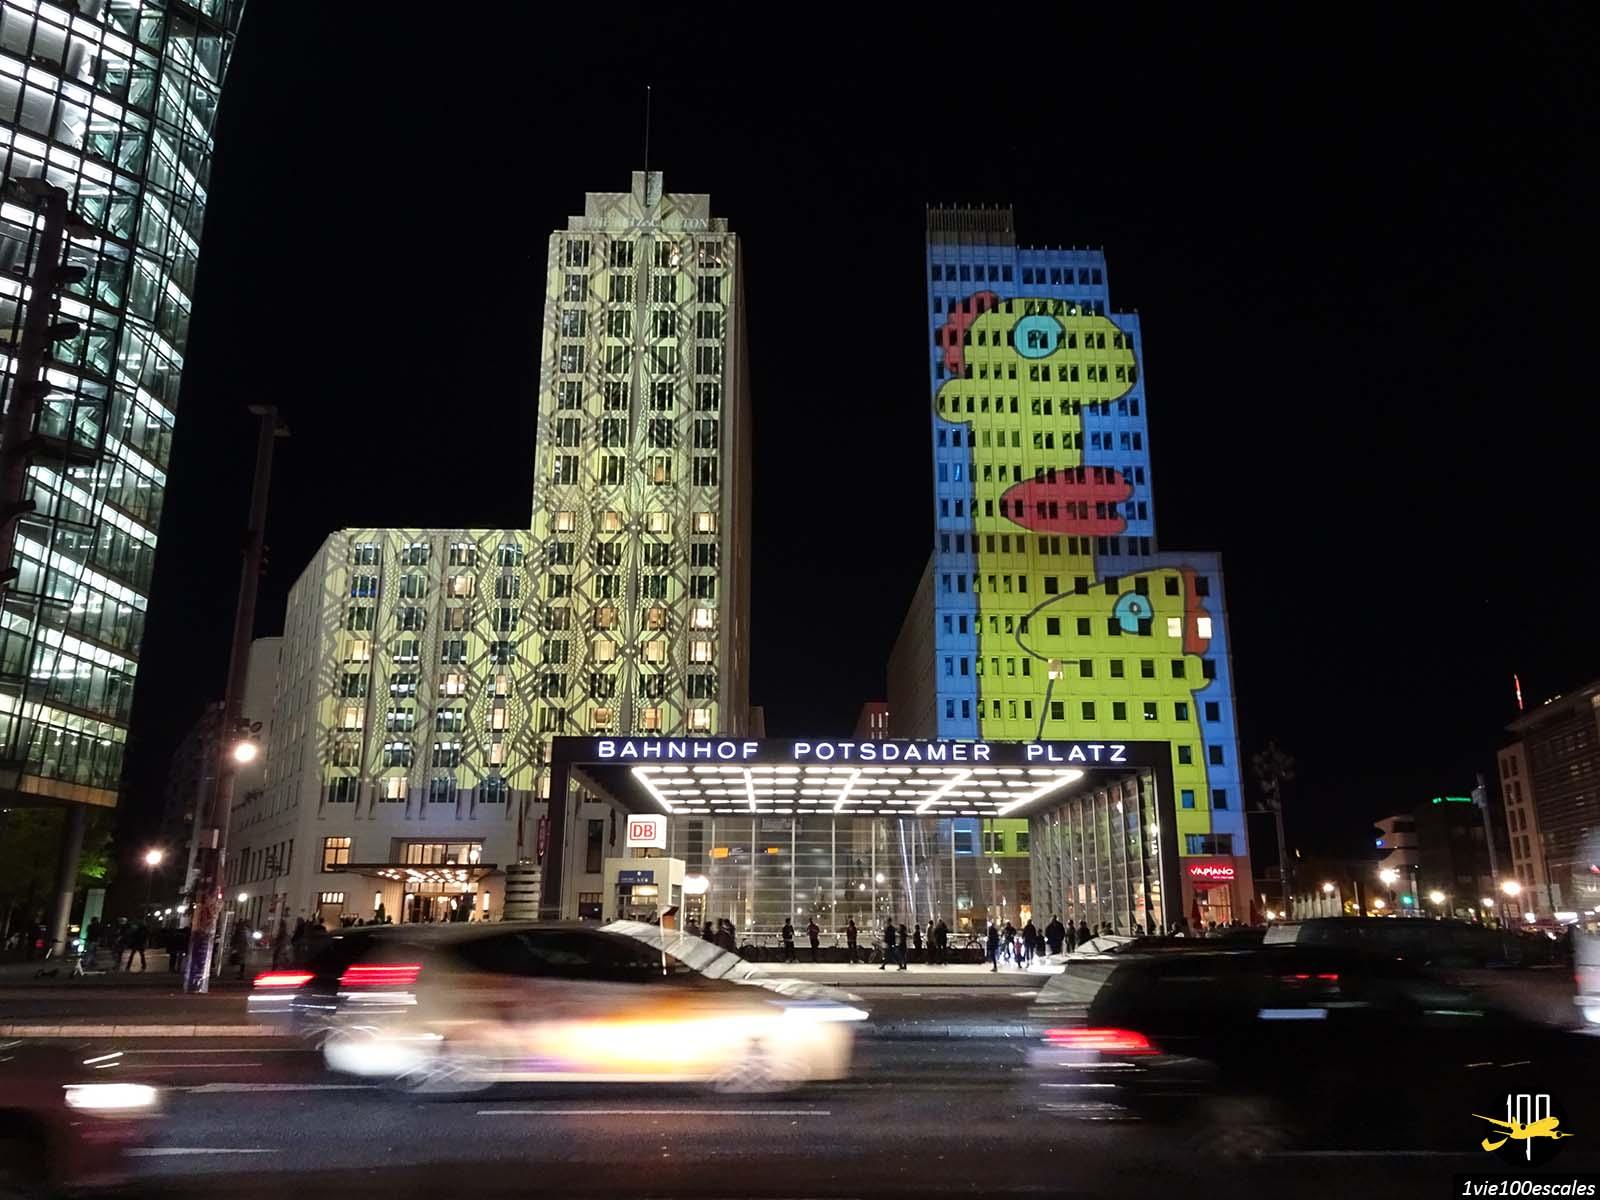 Le bahnhof Potsdamer Platz illuminée le Festival of Lights de Berlin